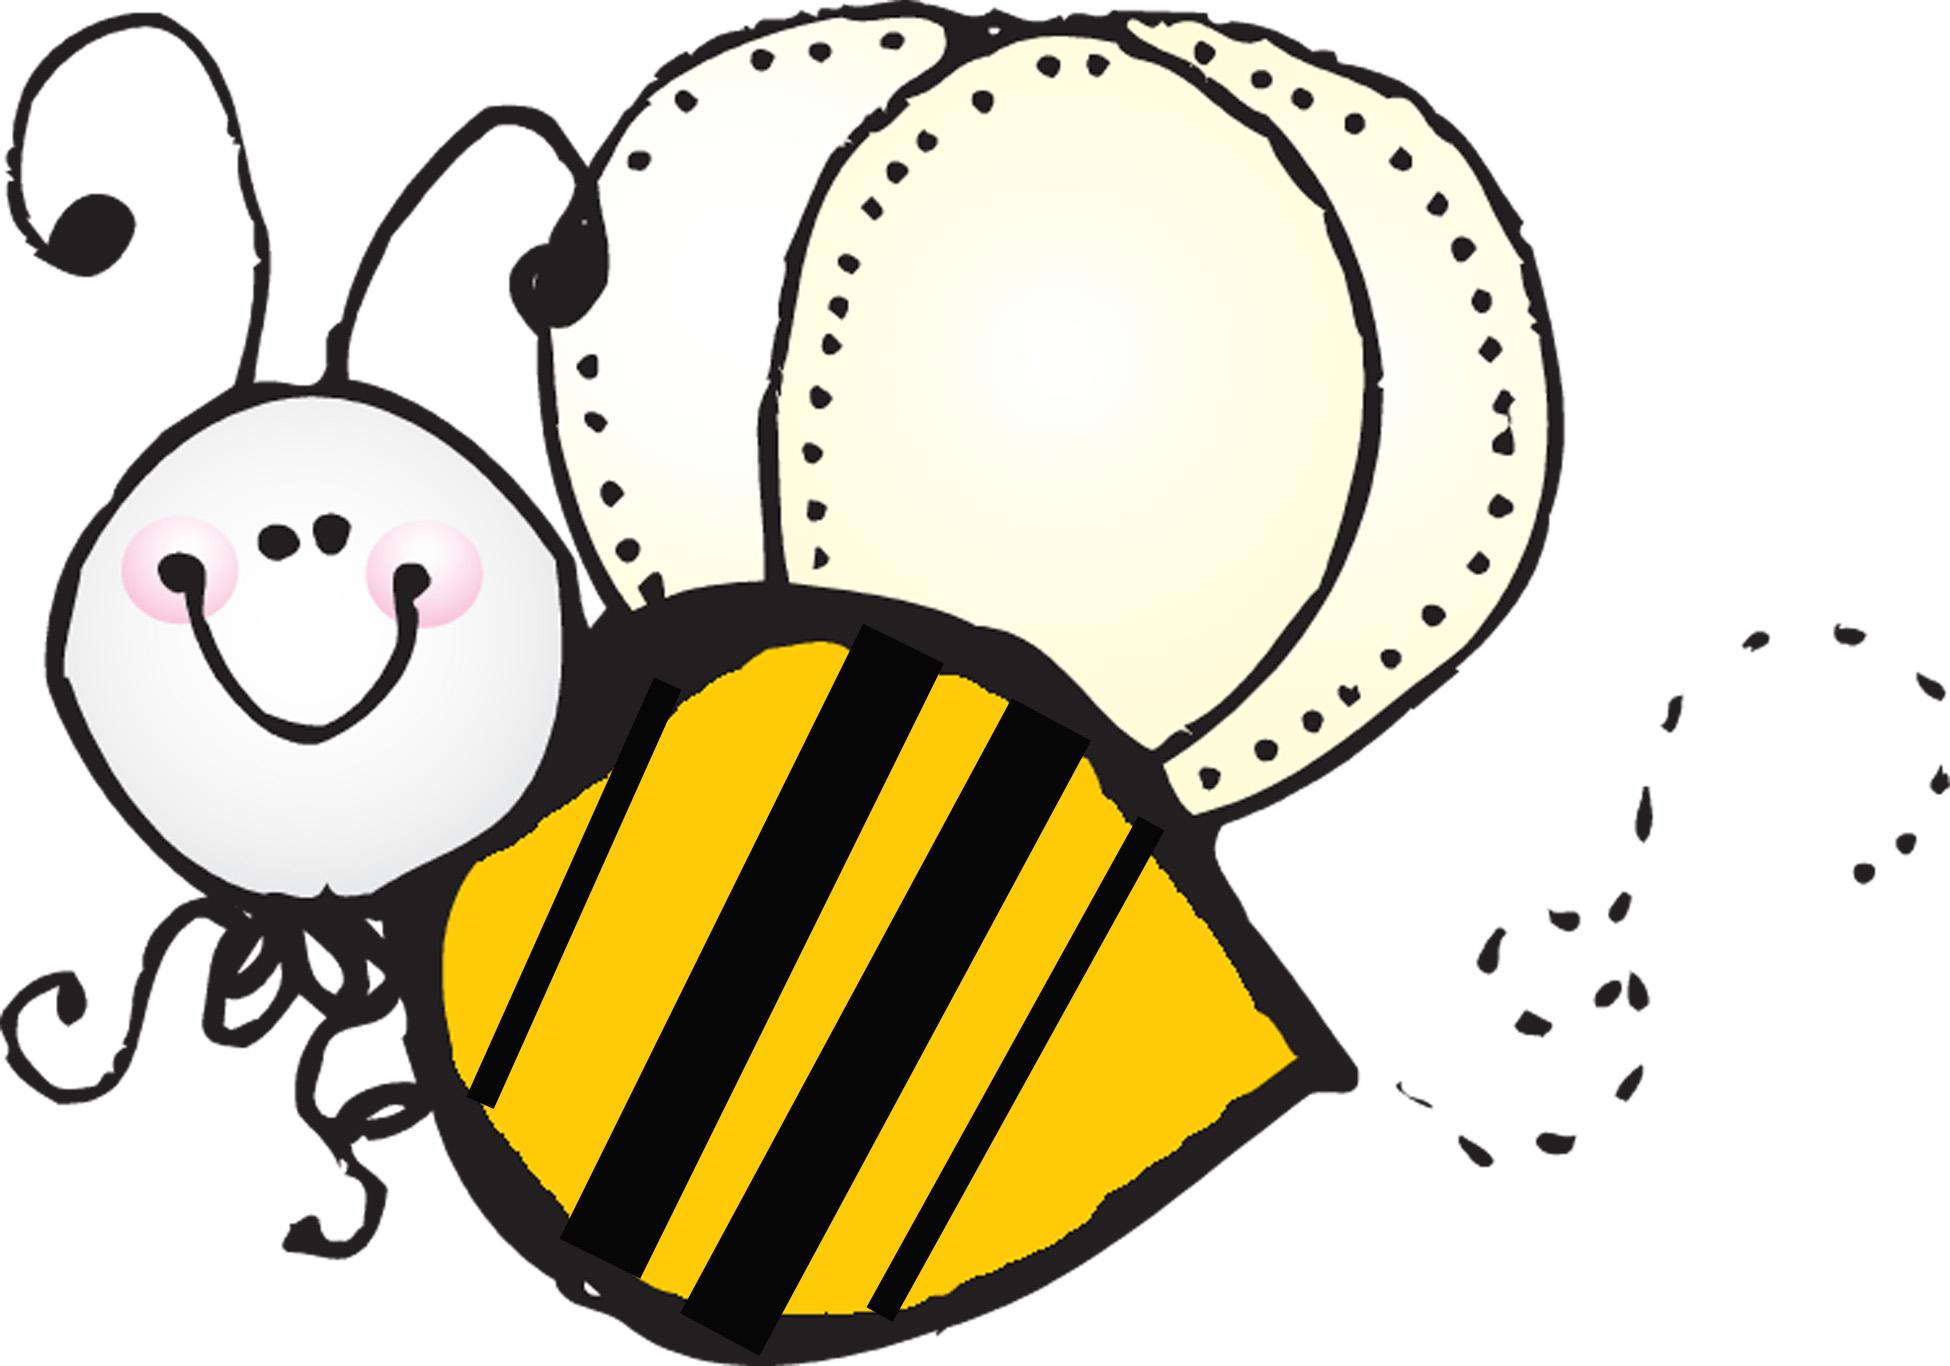 1950x1366 Bumblebee Clipart Winnie The Pooh